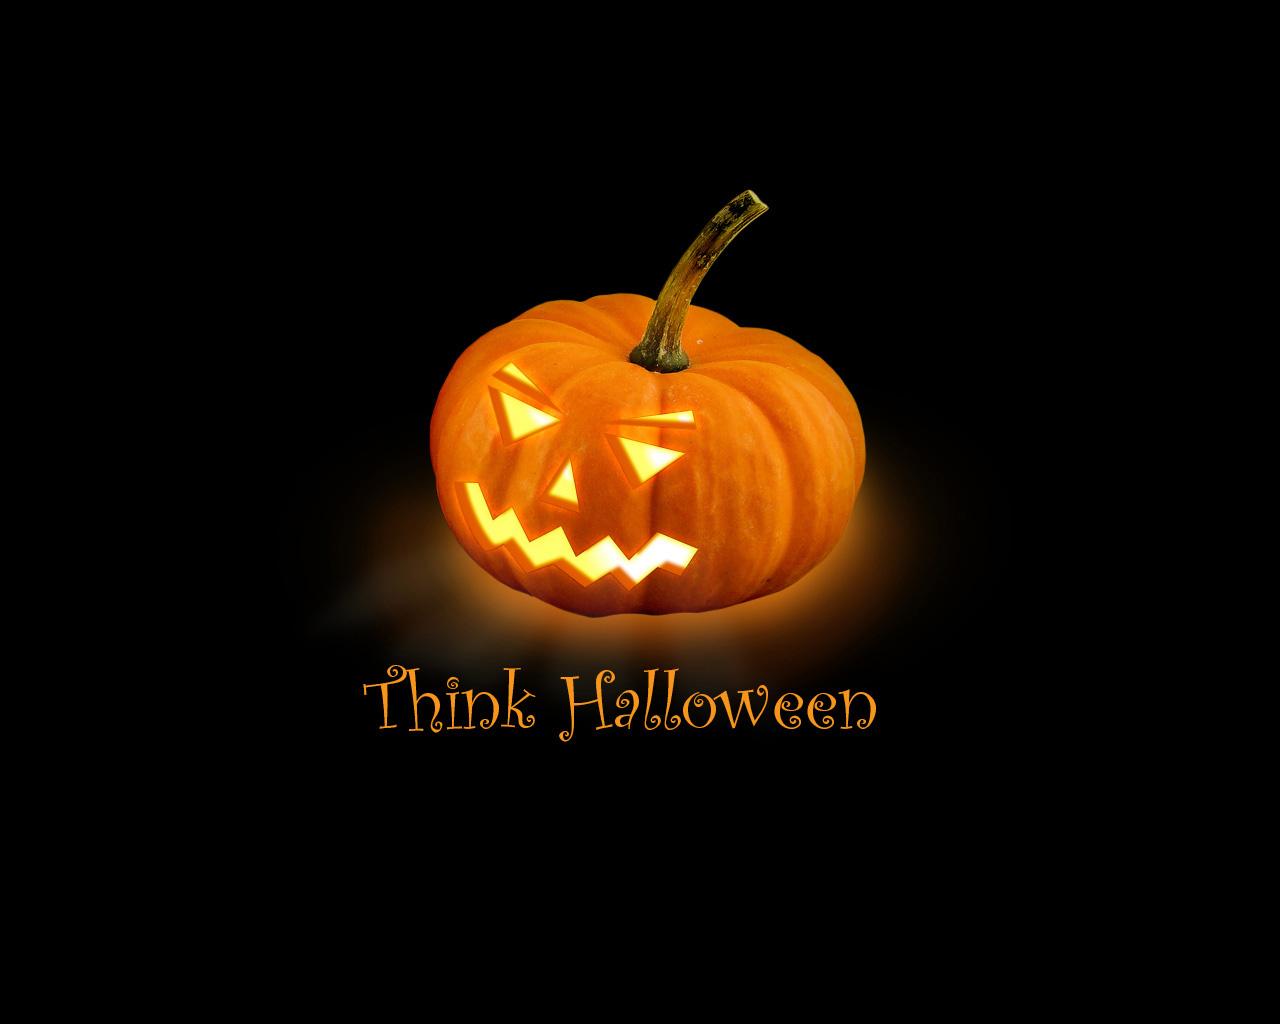 happy halloween ideas photoshop tutorials designstacks. Black Bedroom Furniture Sets. Home Design Ideas